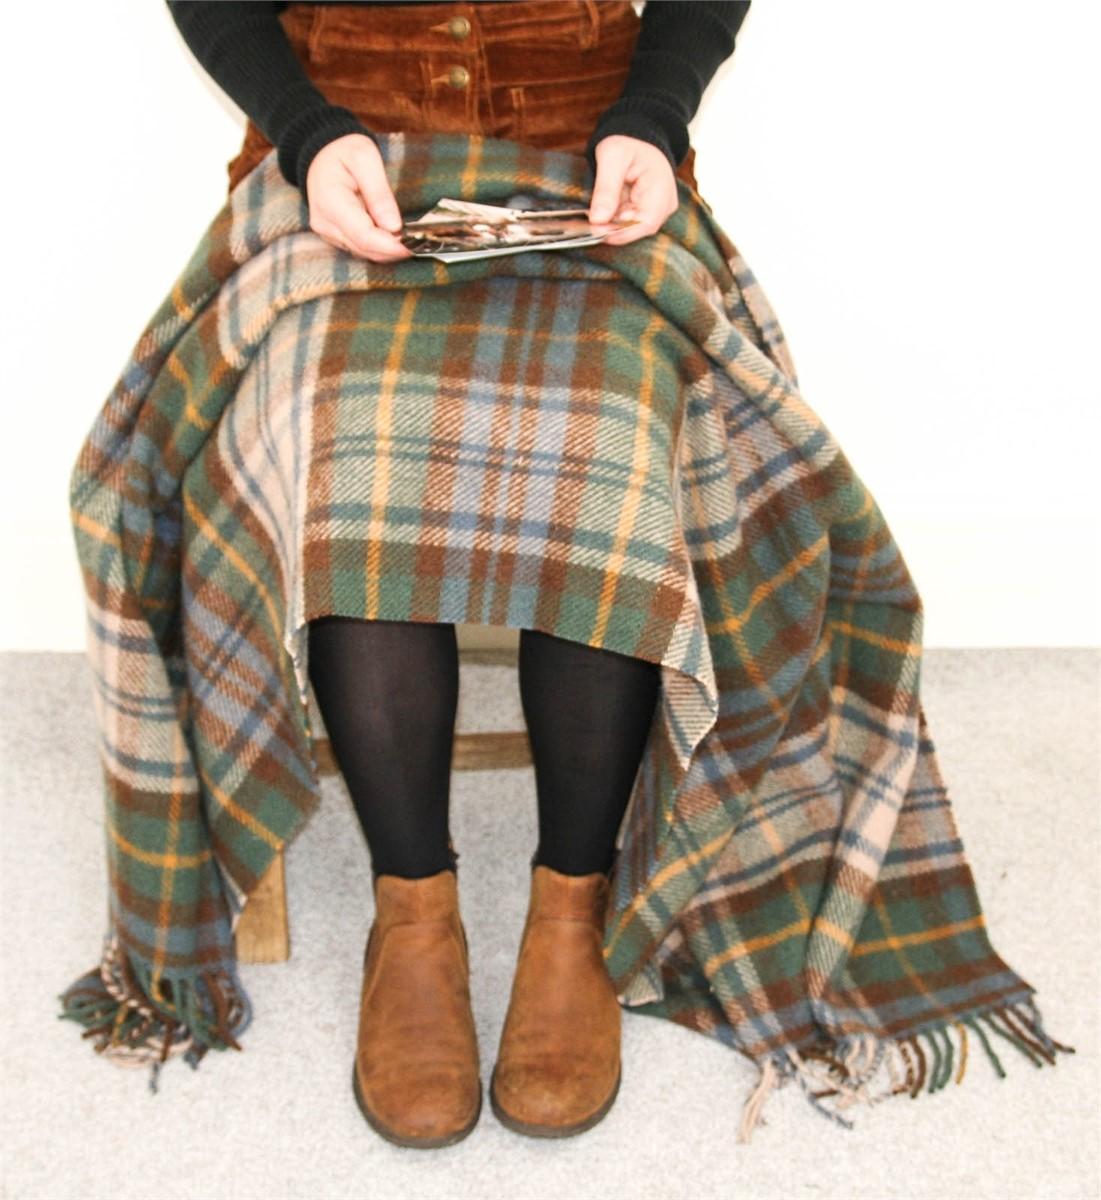 Wool Blanket Online British Made Gifts Antique Dress